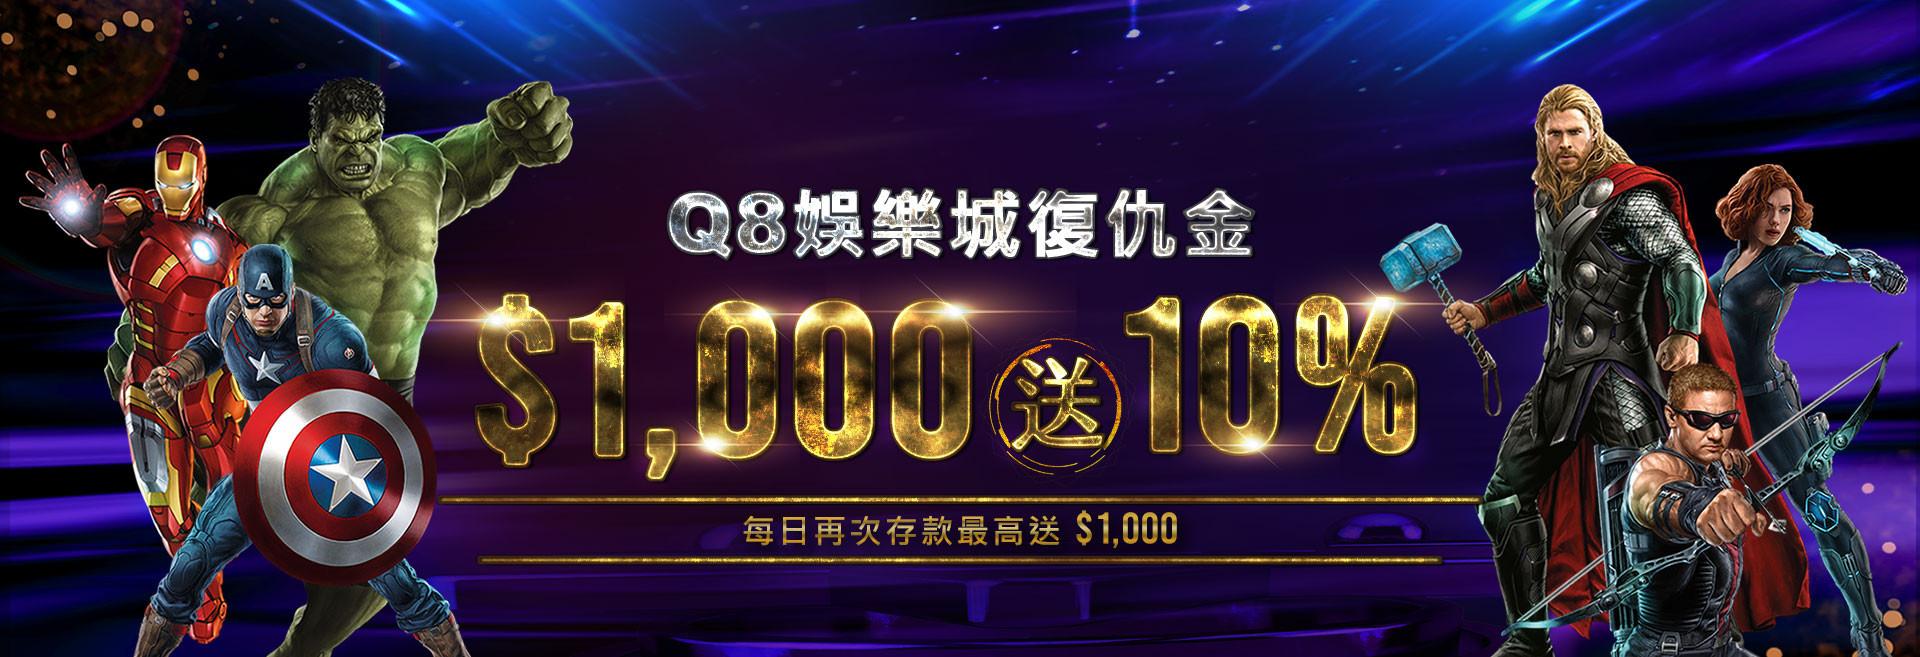 Q8娛樂城復仇金每日再次存款1,000送10%